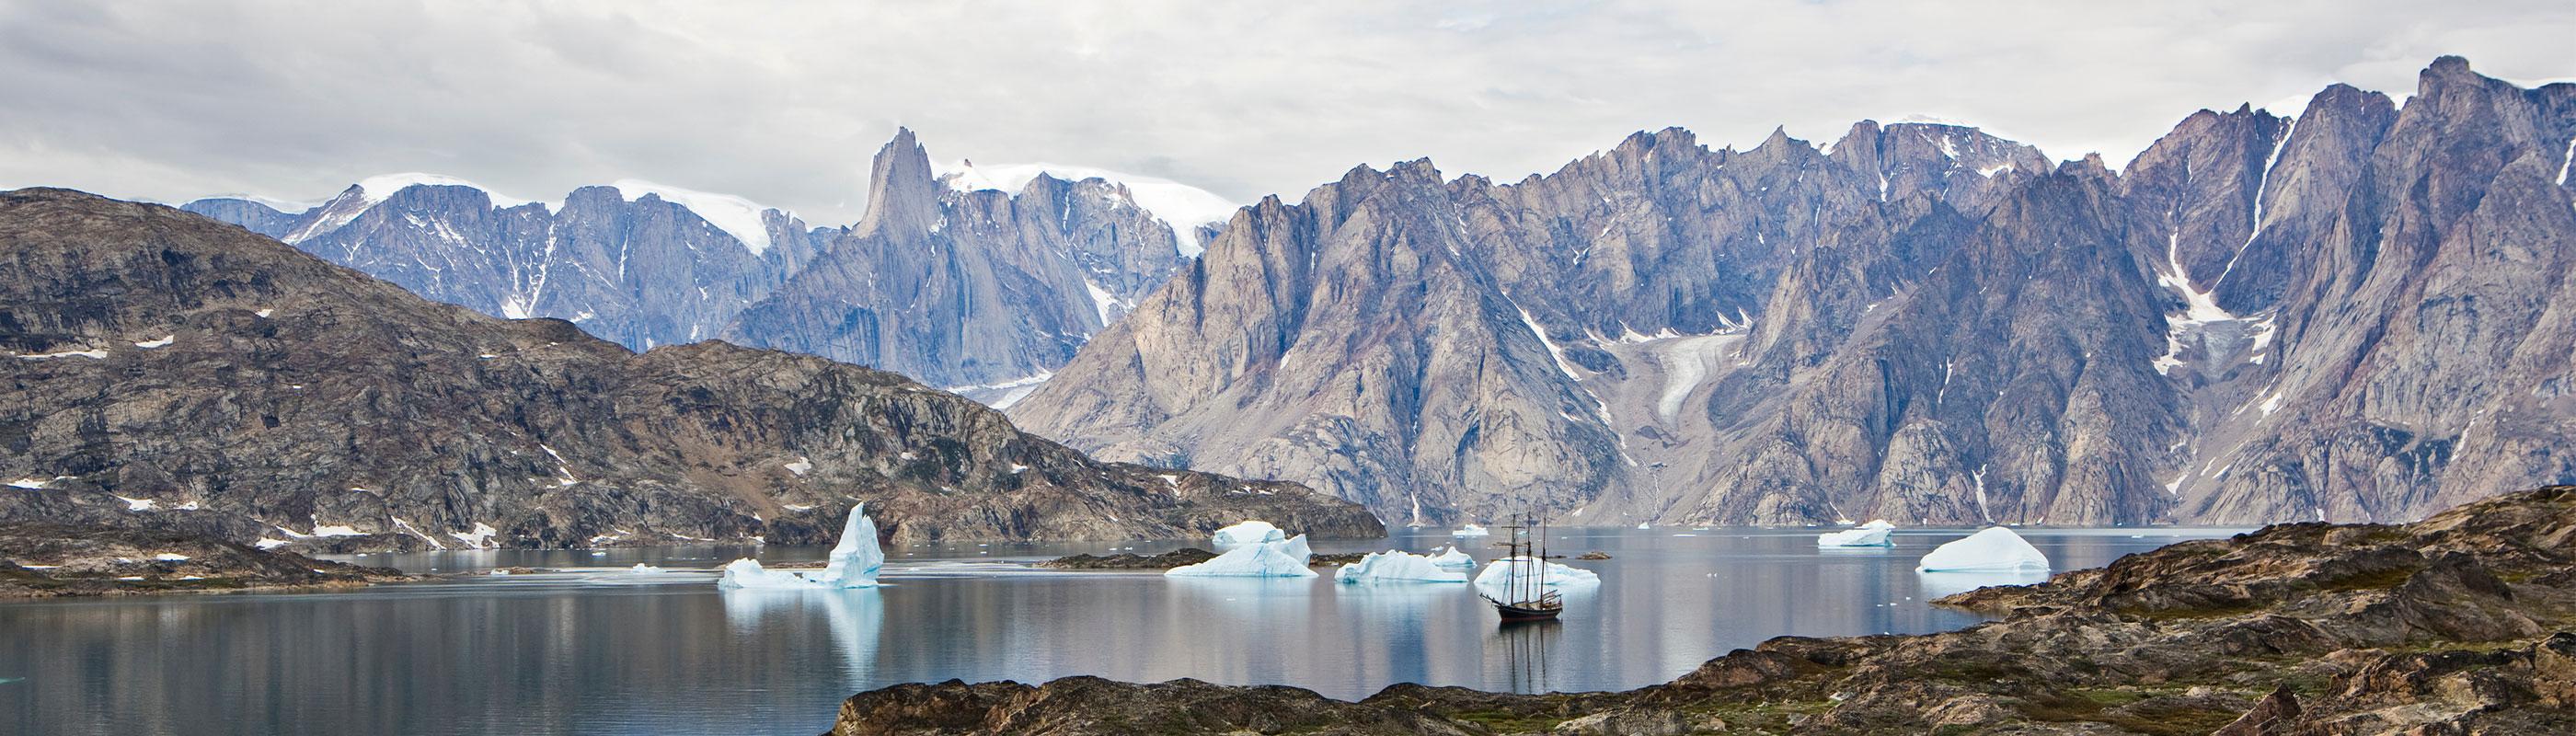 Groenlandpagina-slider5